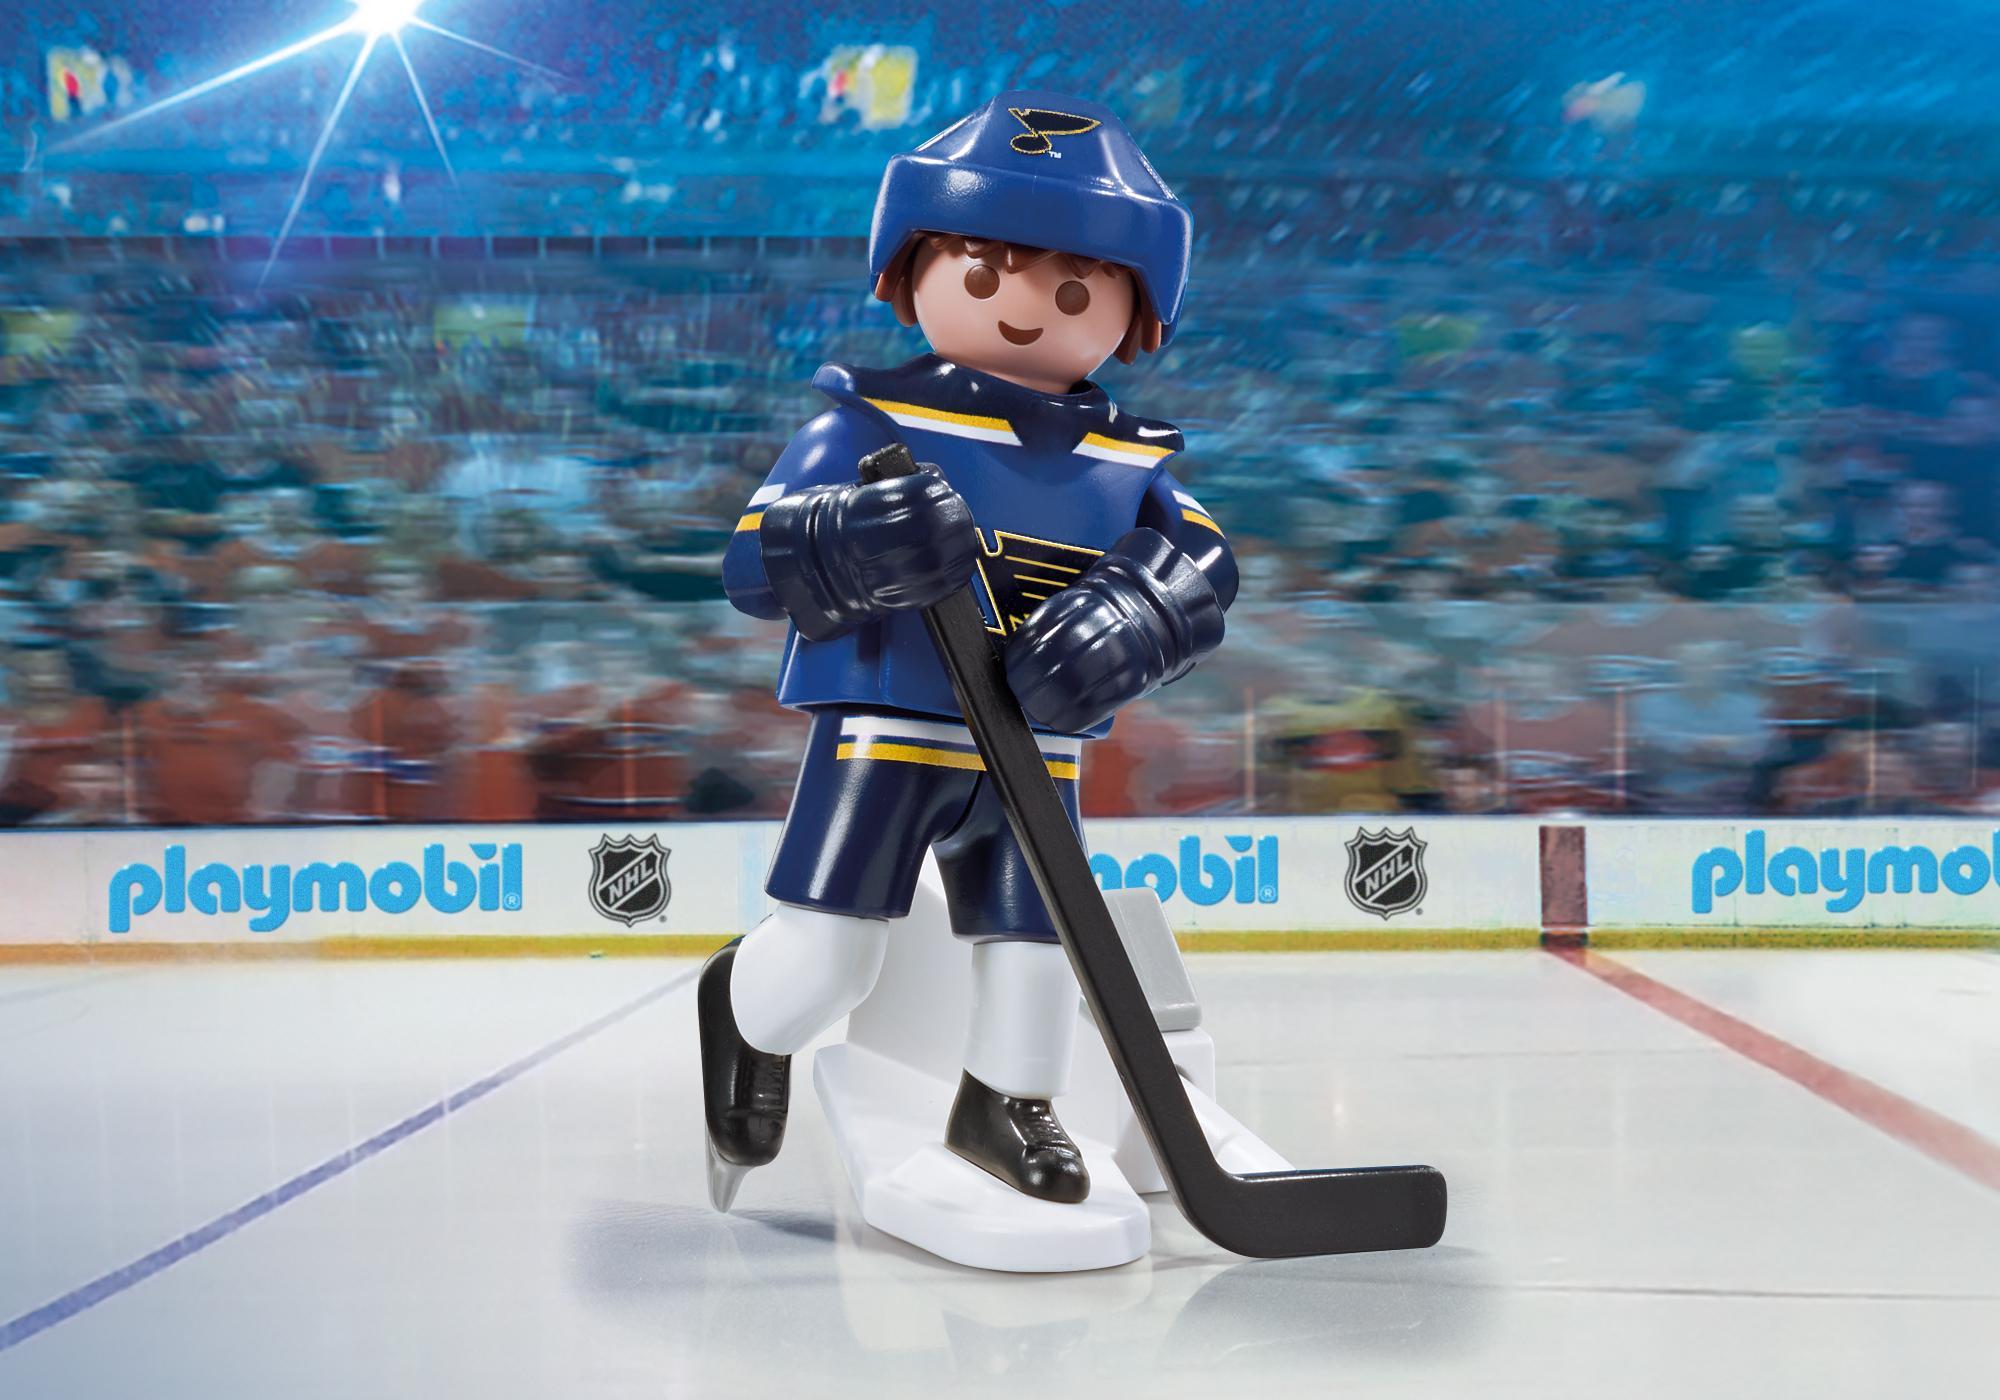 http://media.playmobil.com/i/playmobil/9184_product_detail/NHL™ St. Louis Blues™ Player